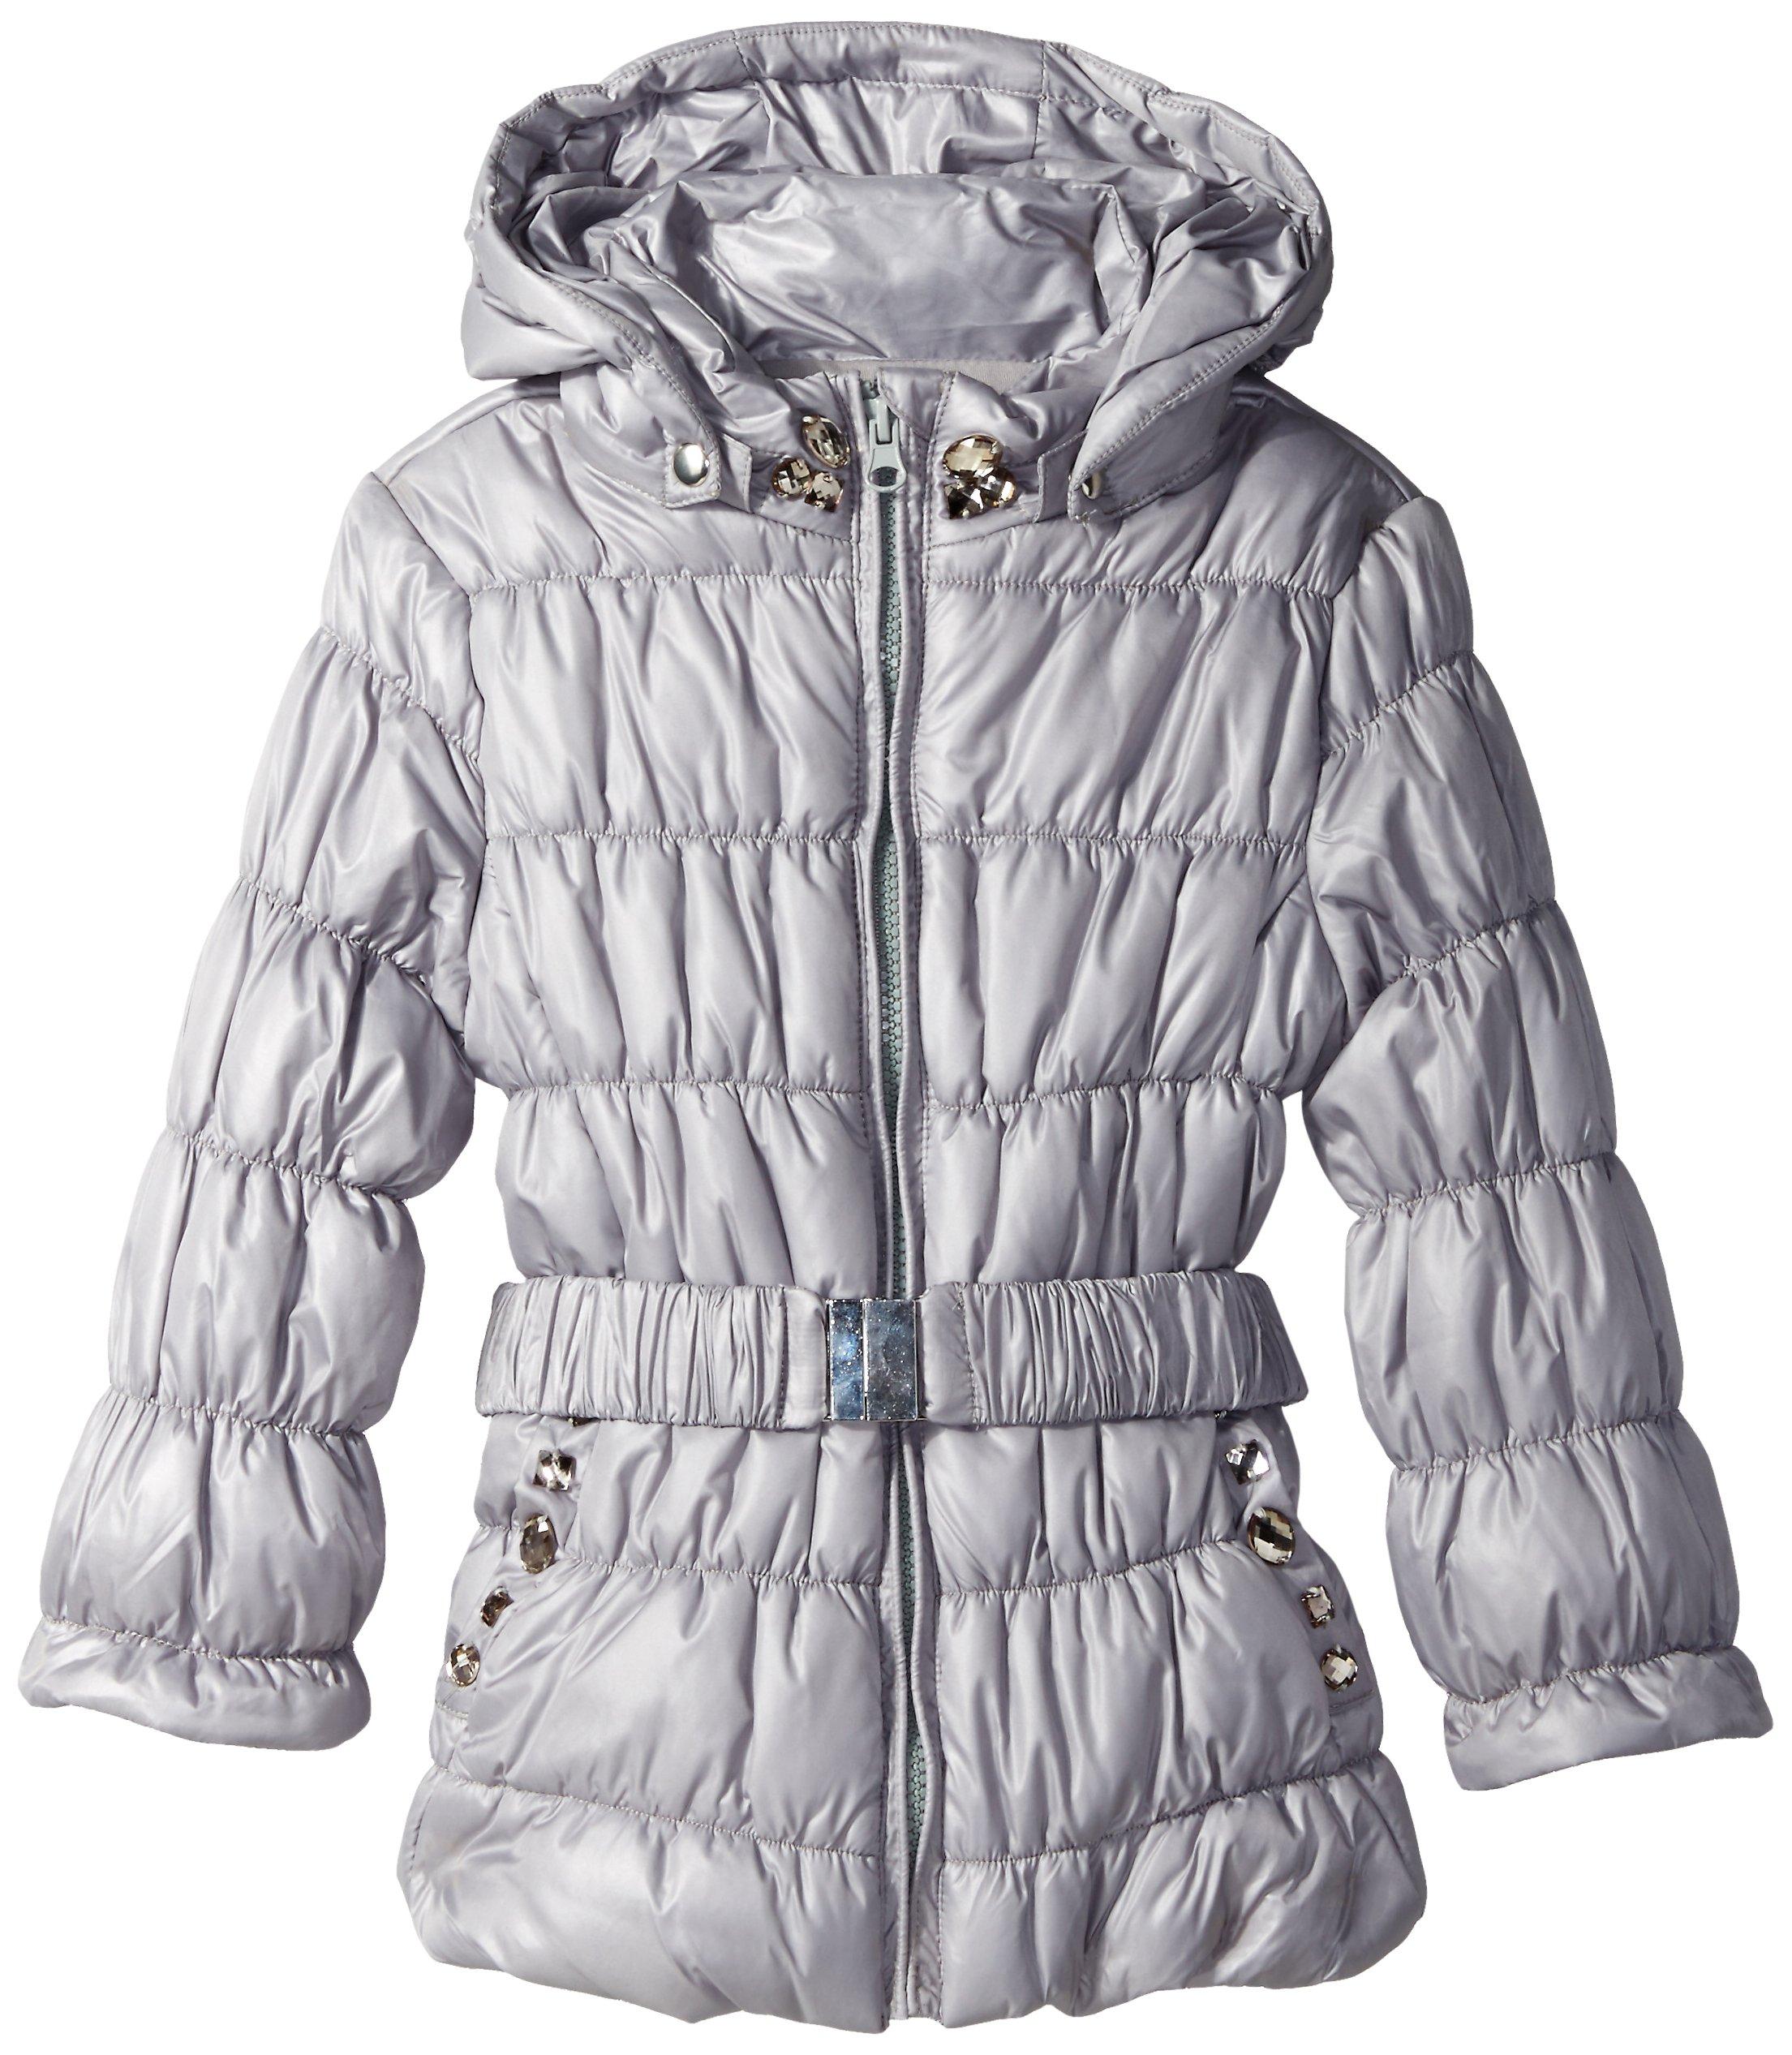 Kate Mack Little Girls' Puffer Coat with Belt and Rhinestones, Grey, 6